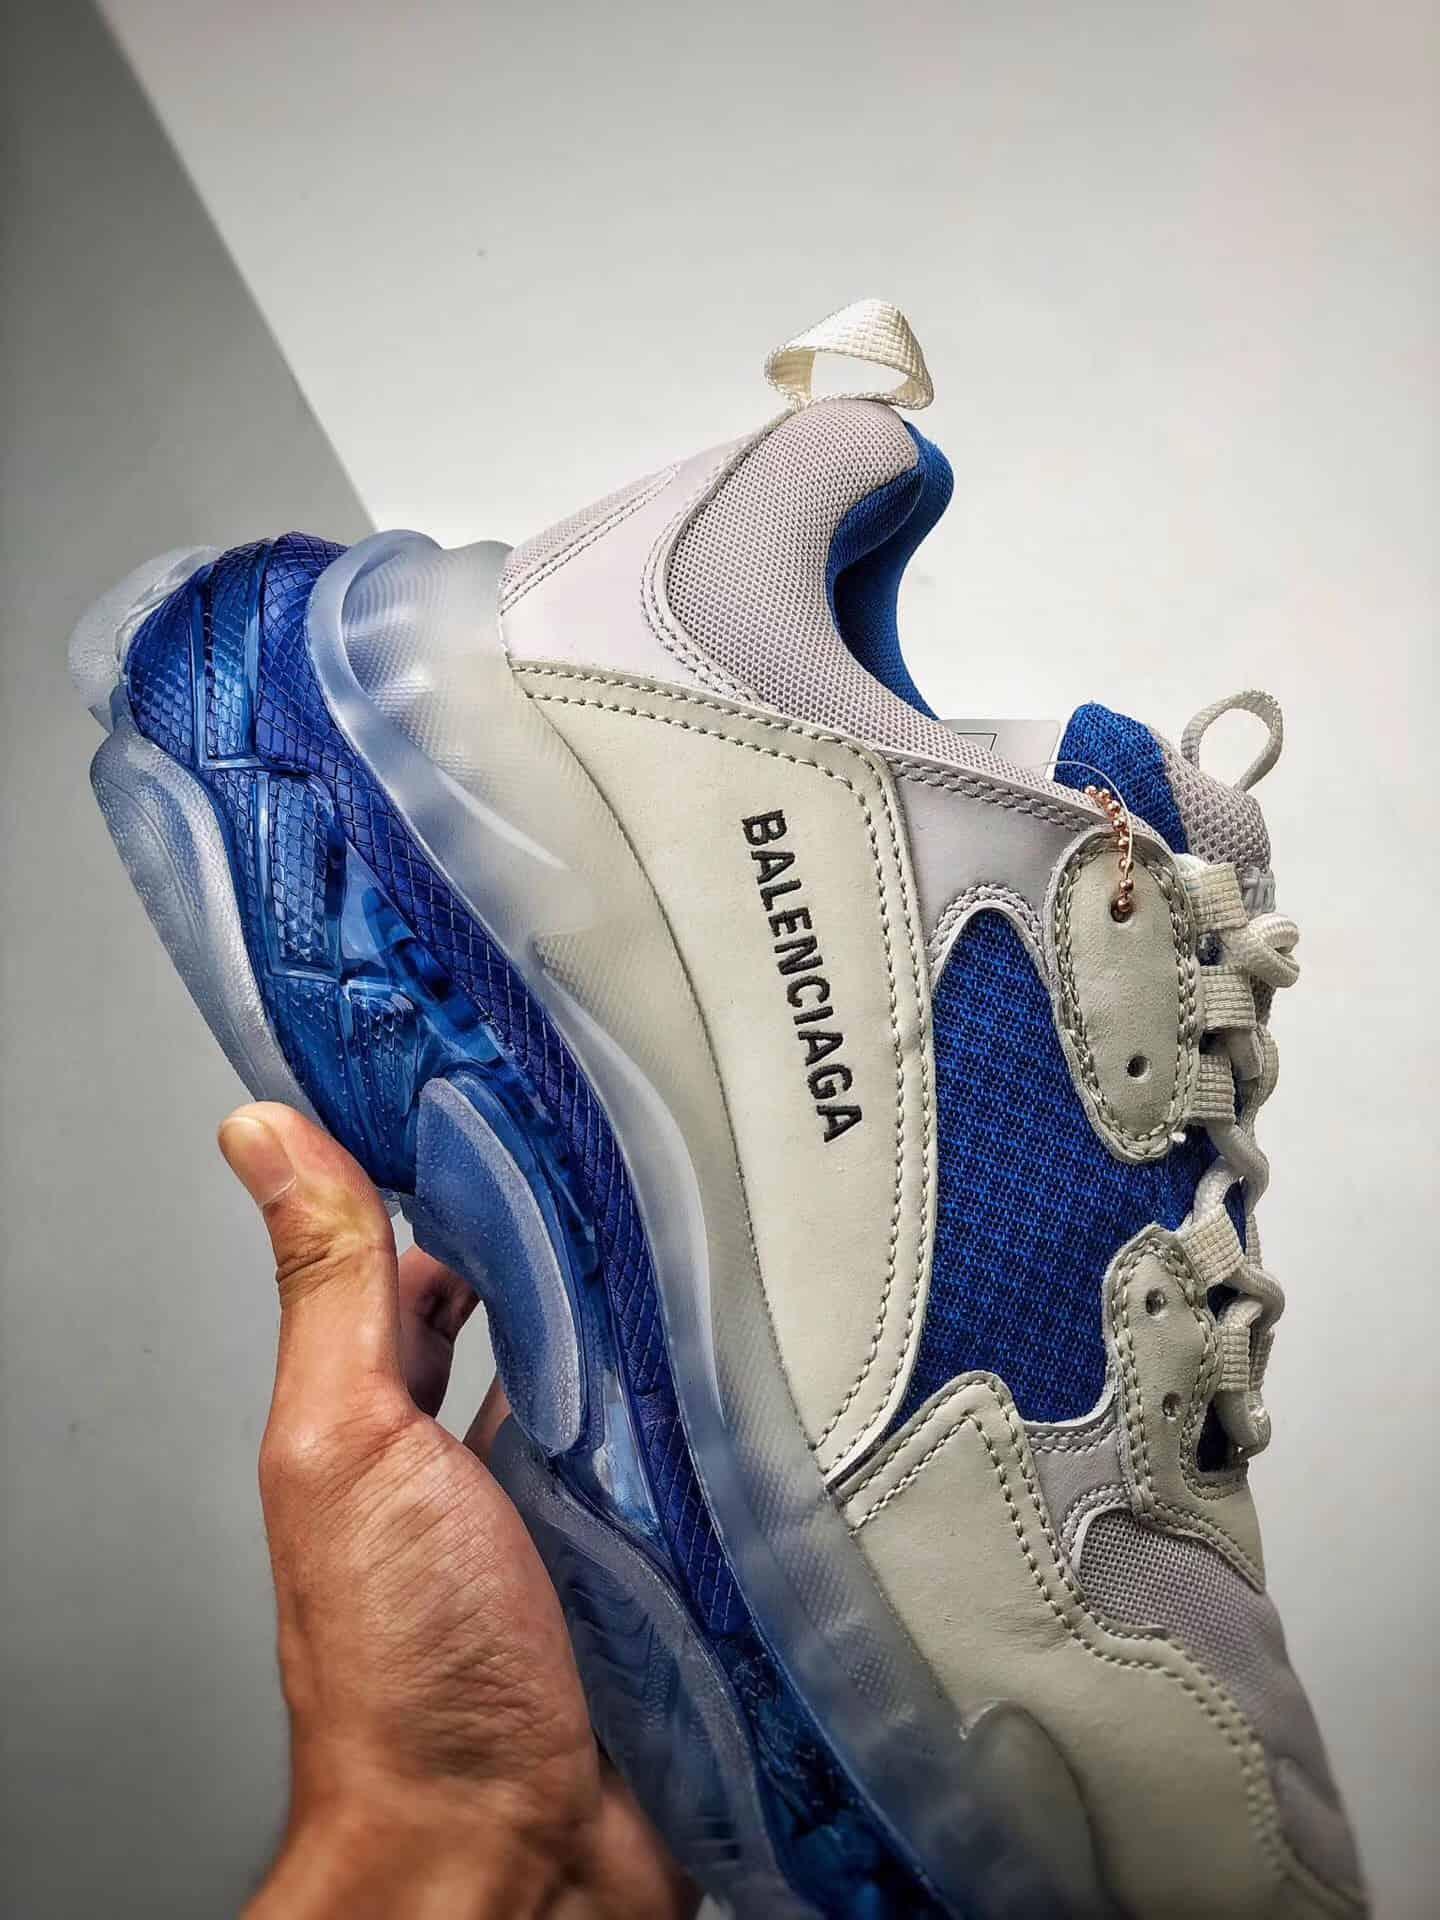 Giày Balenciaga Triple S đế trong màu xanh bản cao cấp